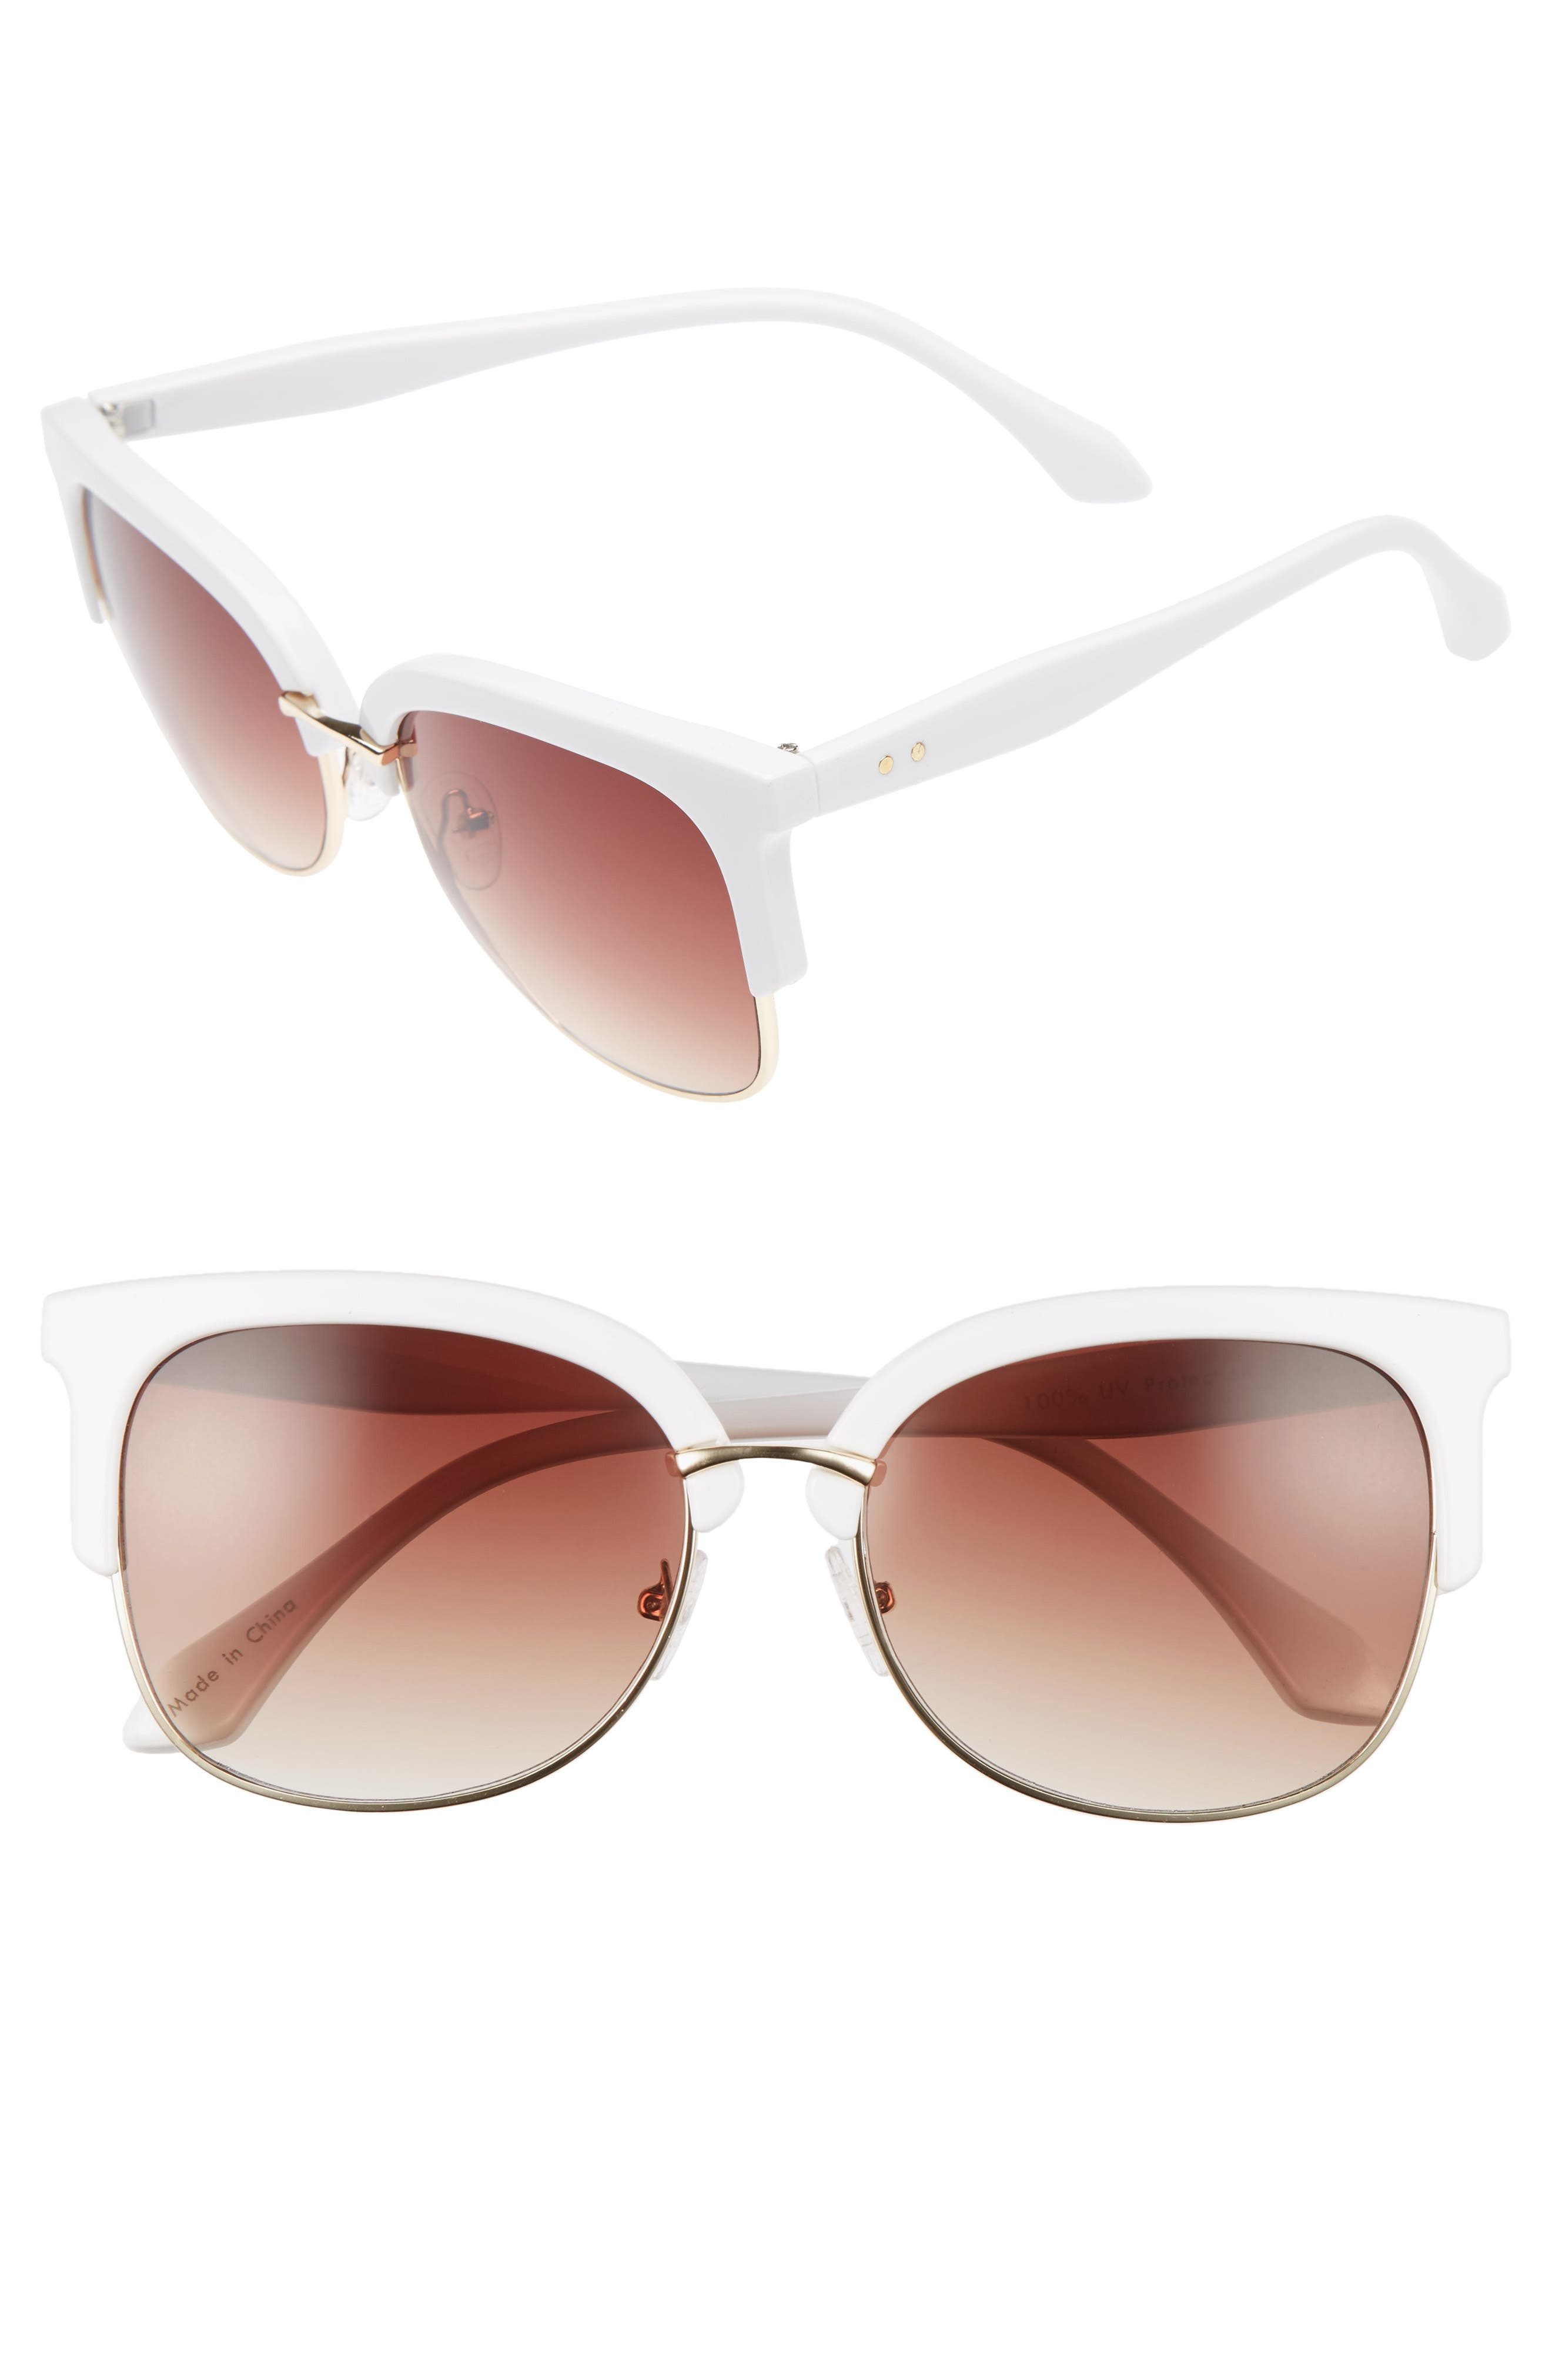 Alternate Image 1 Selected - BP. 55mm Square Sunglasses